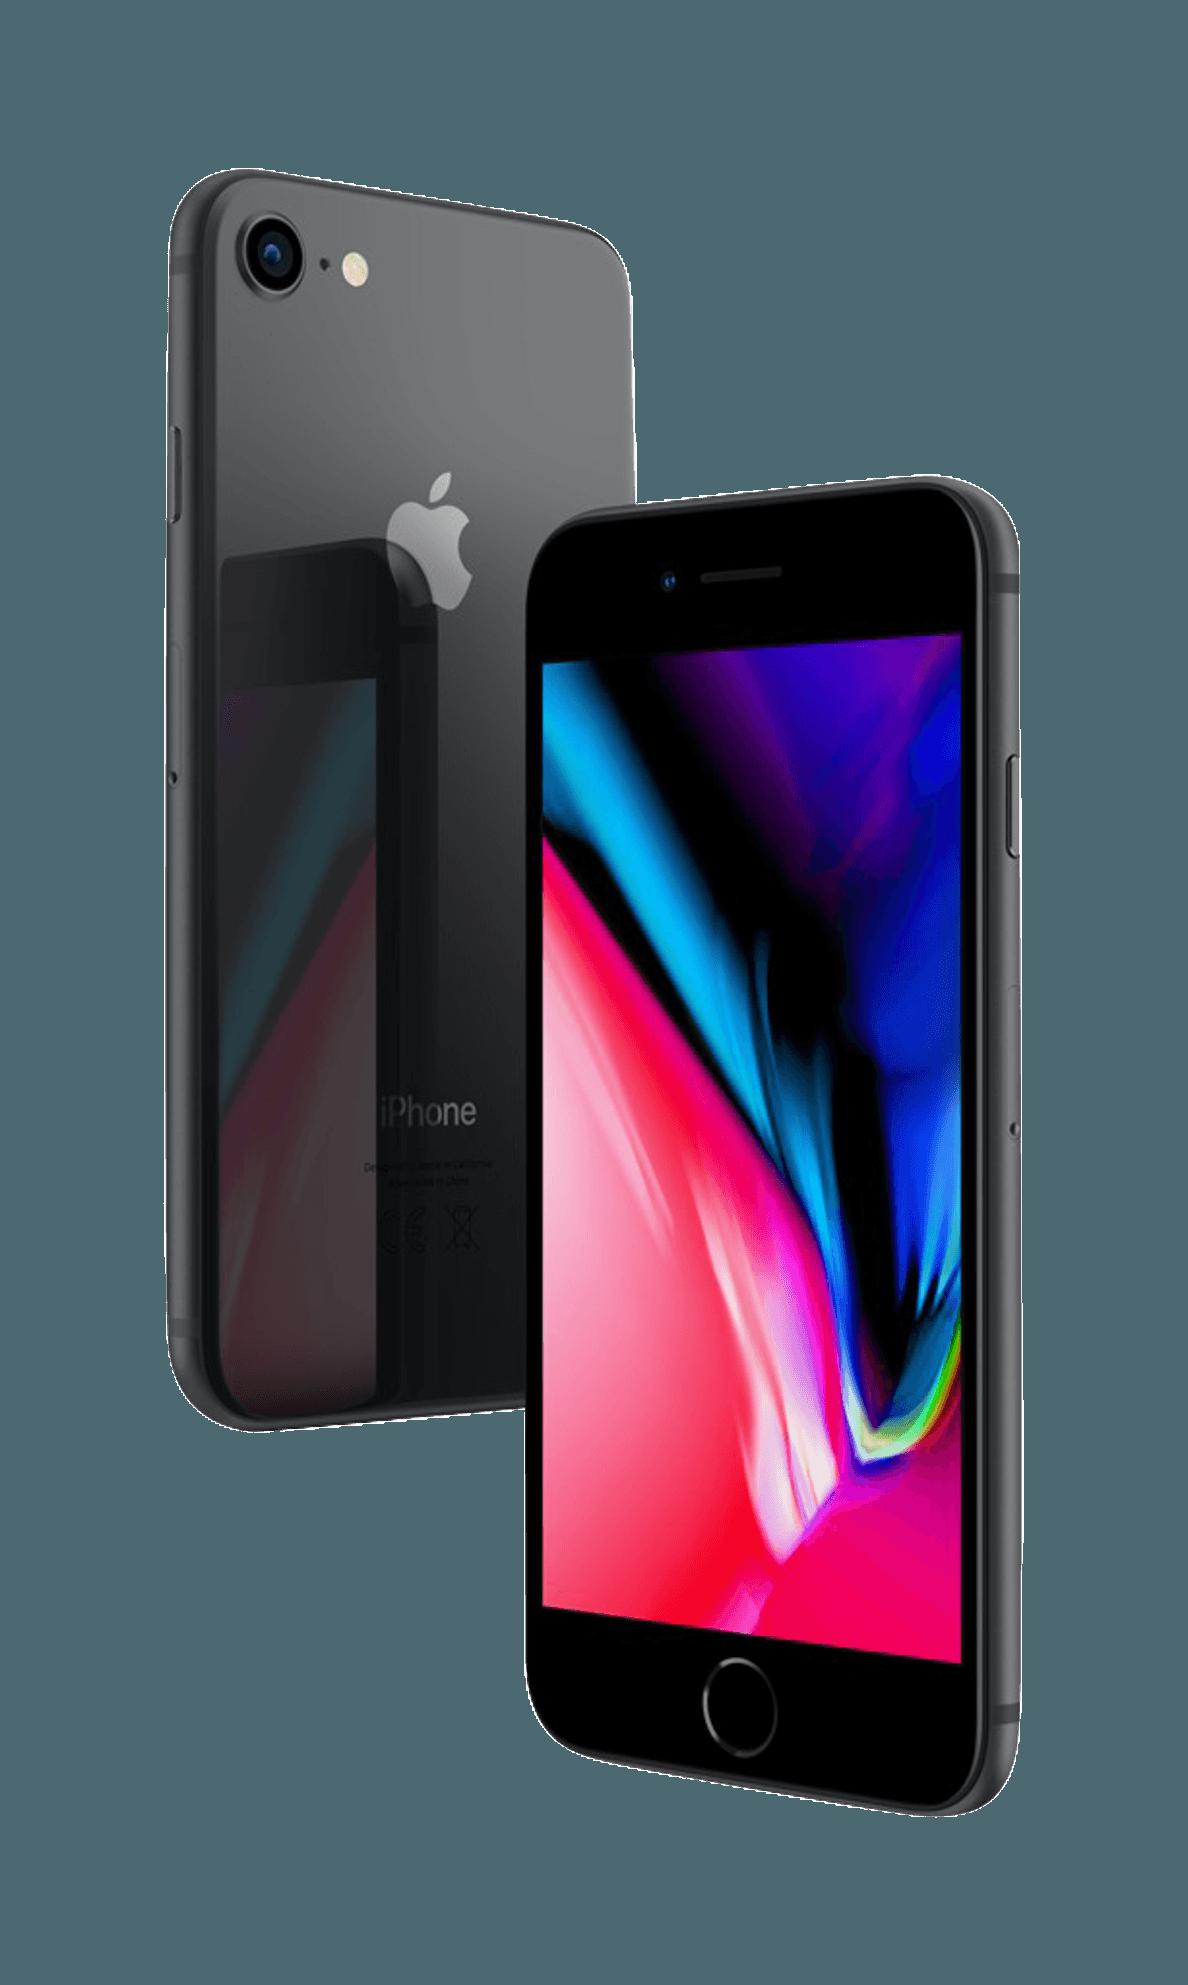 Apple Iphone 8 Smartphone 256 Gb Space Grey 00190198452474 Eine Neue Iphone Generation N N Das Iphone 8 Plus Ist Eine Prepaid Phones Apple Iphone Iphone